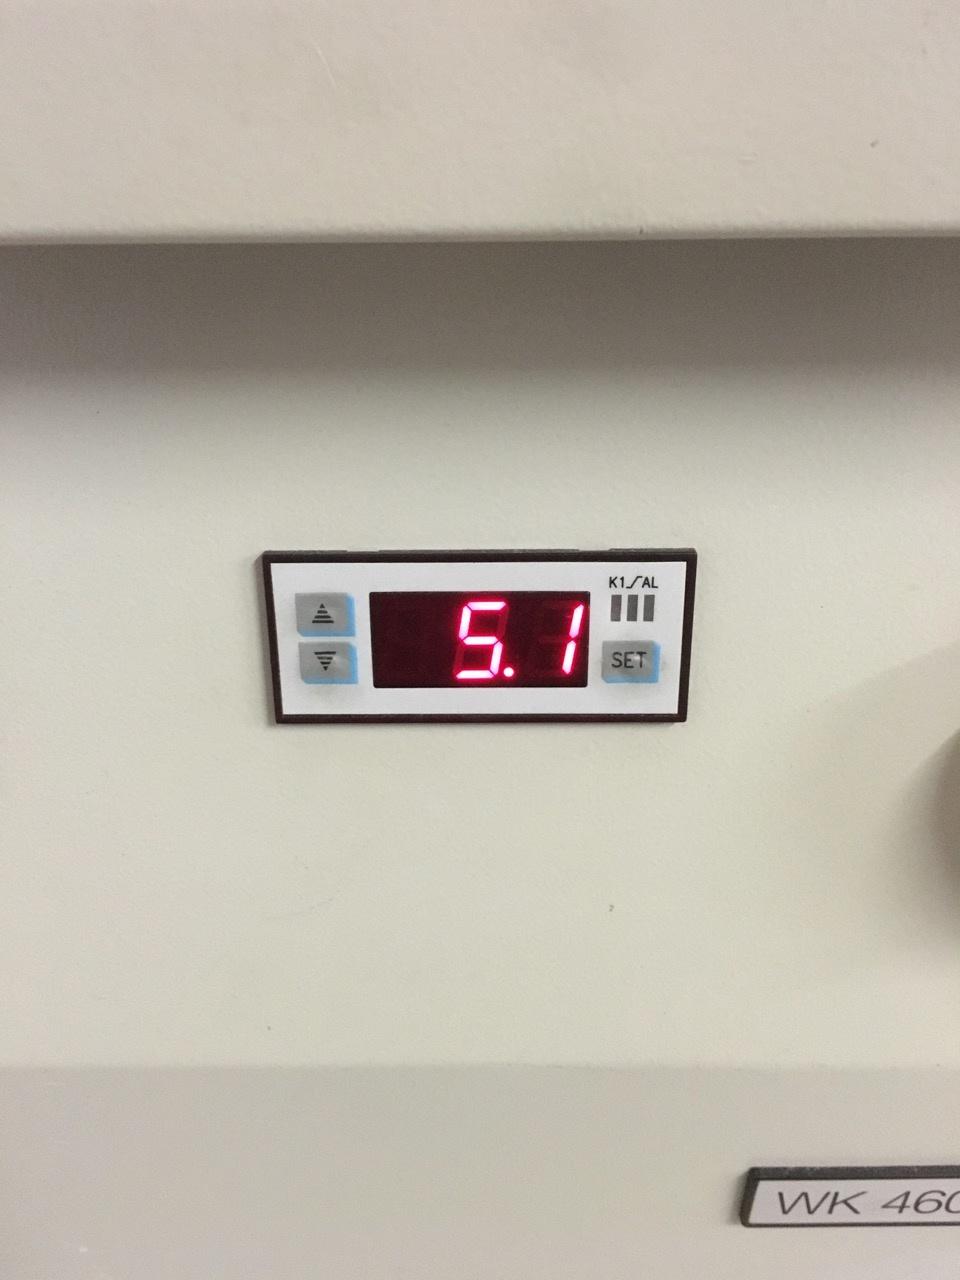 Lauda Lauda WK 4600 Umwälzthermostat (4600W Kühlleistung)